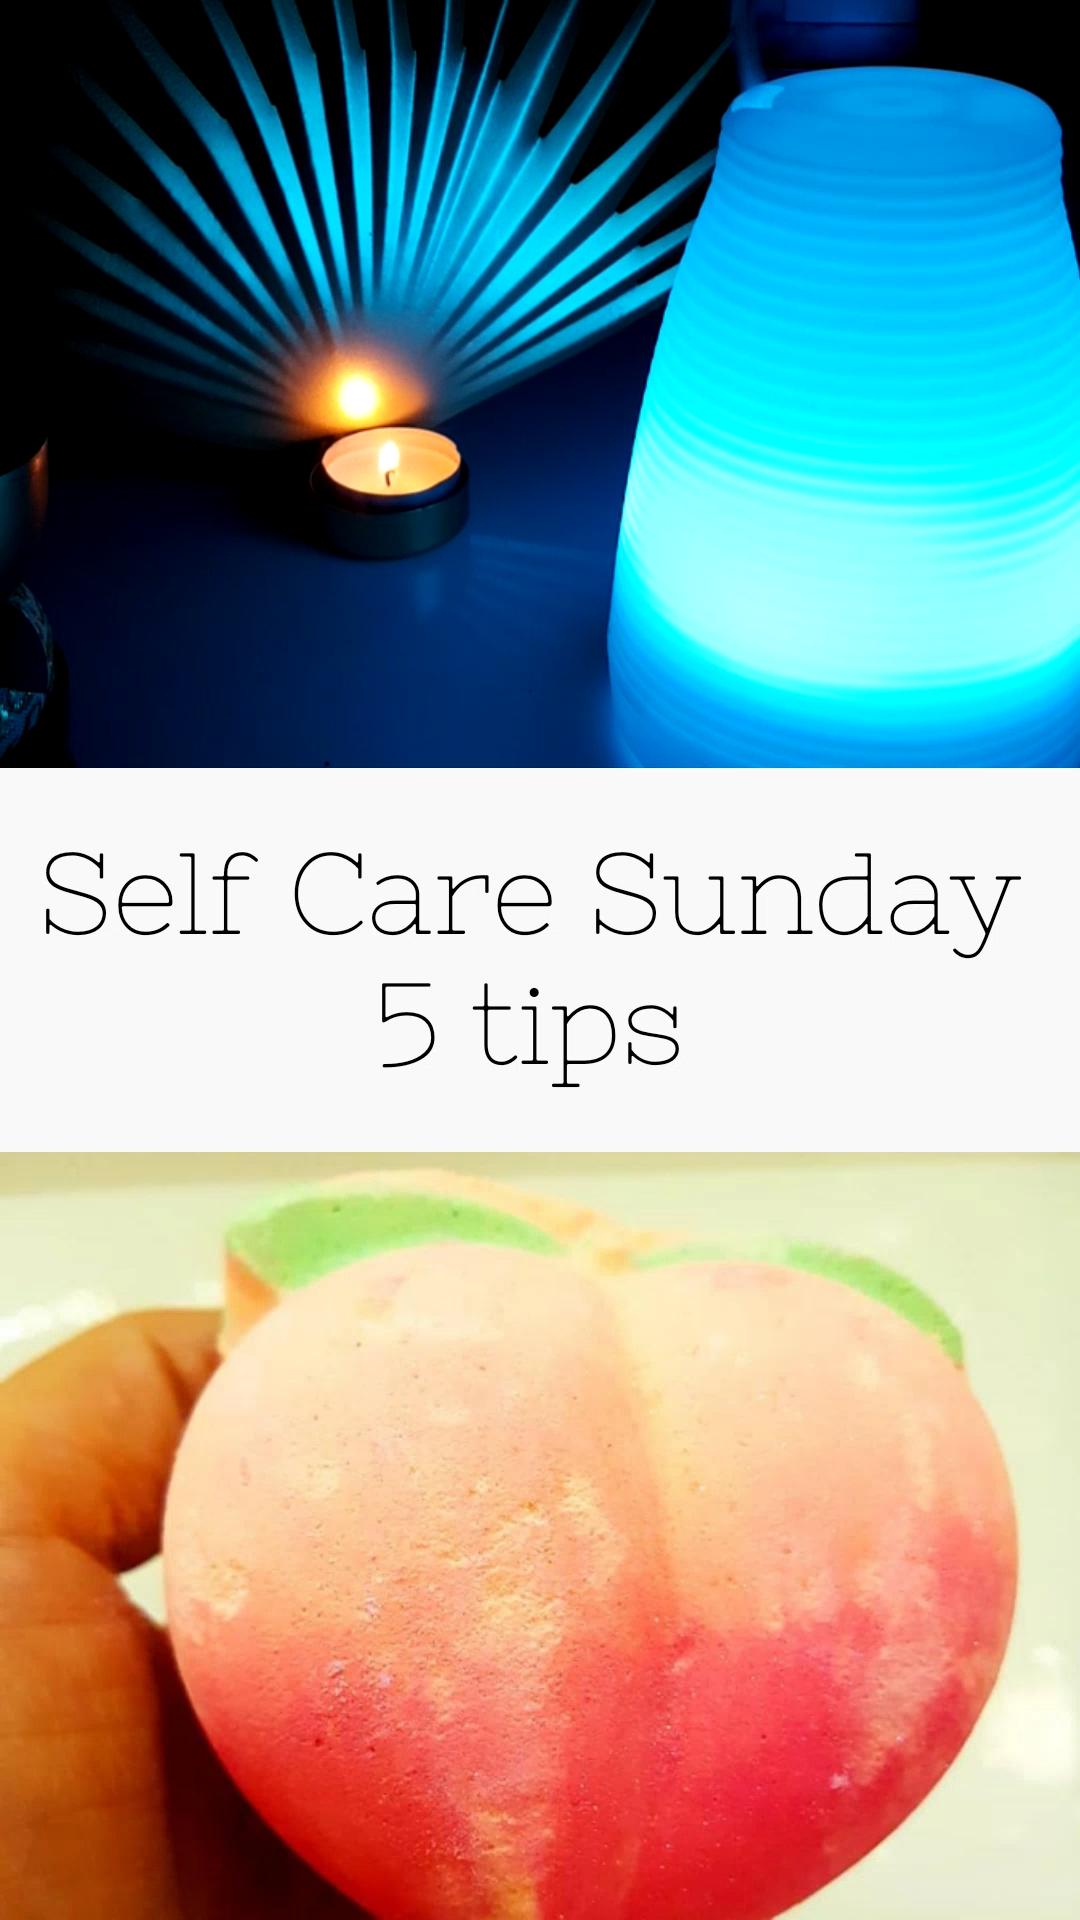 Self Care Sunday 5 Tips